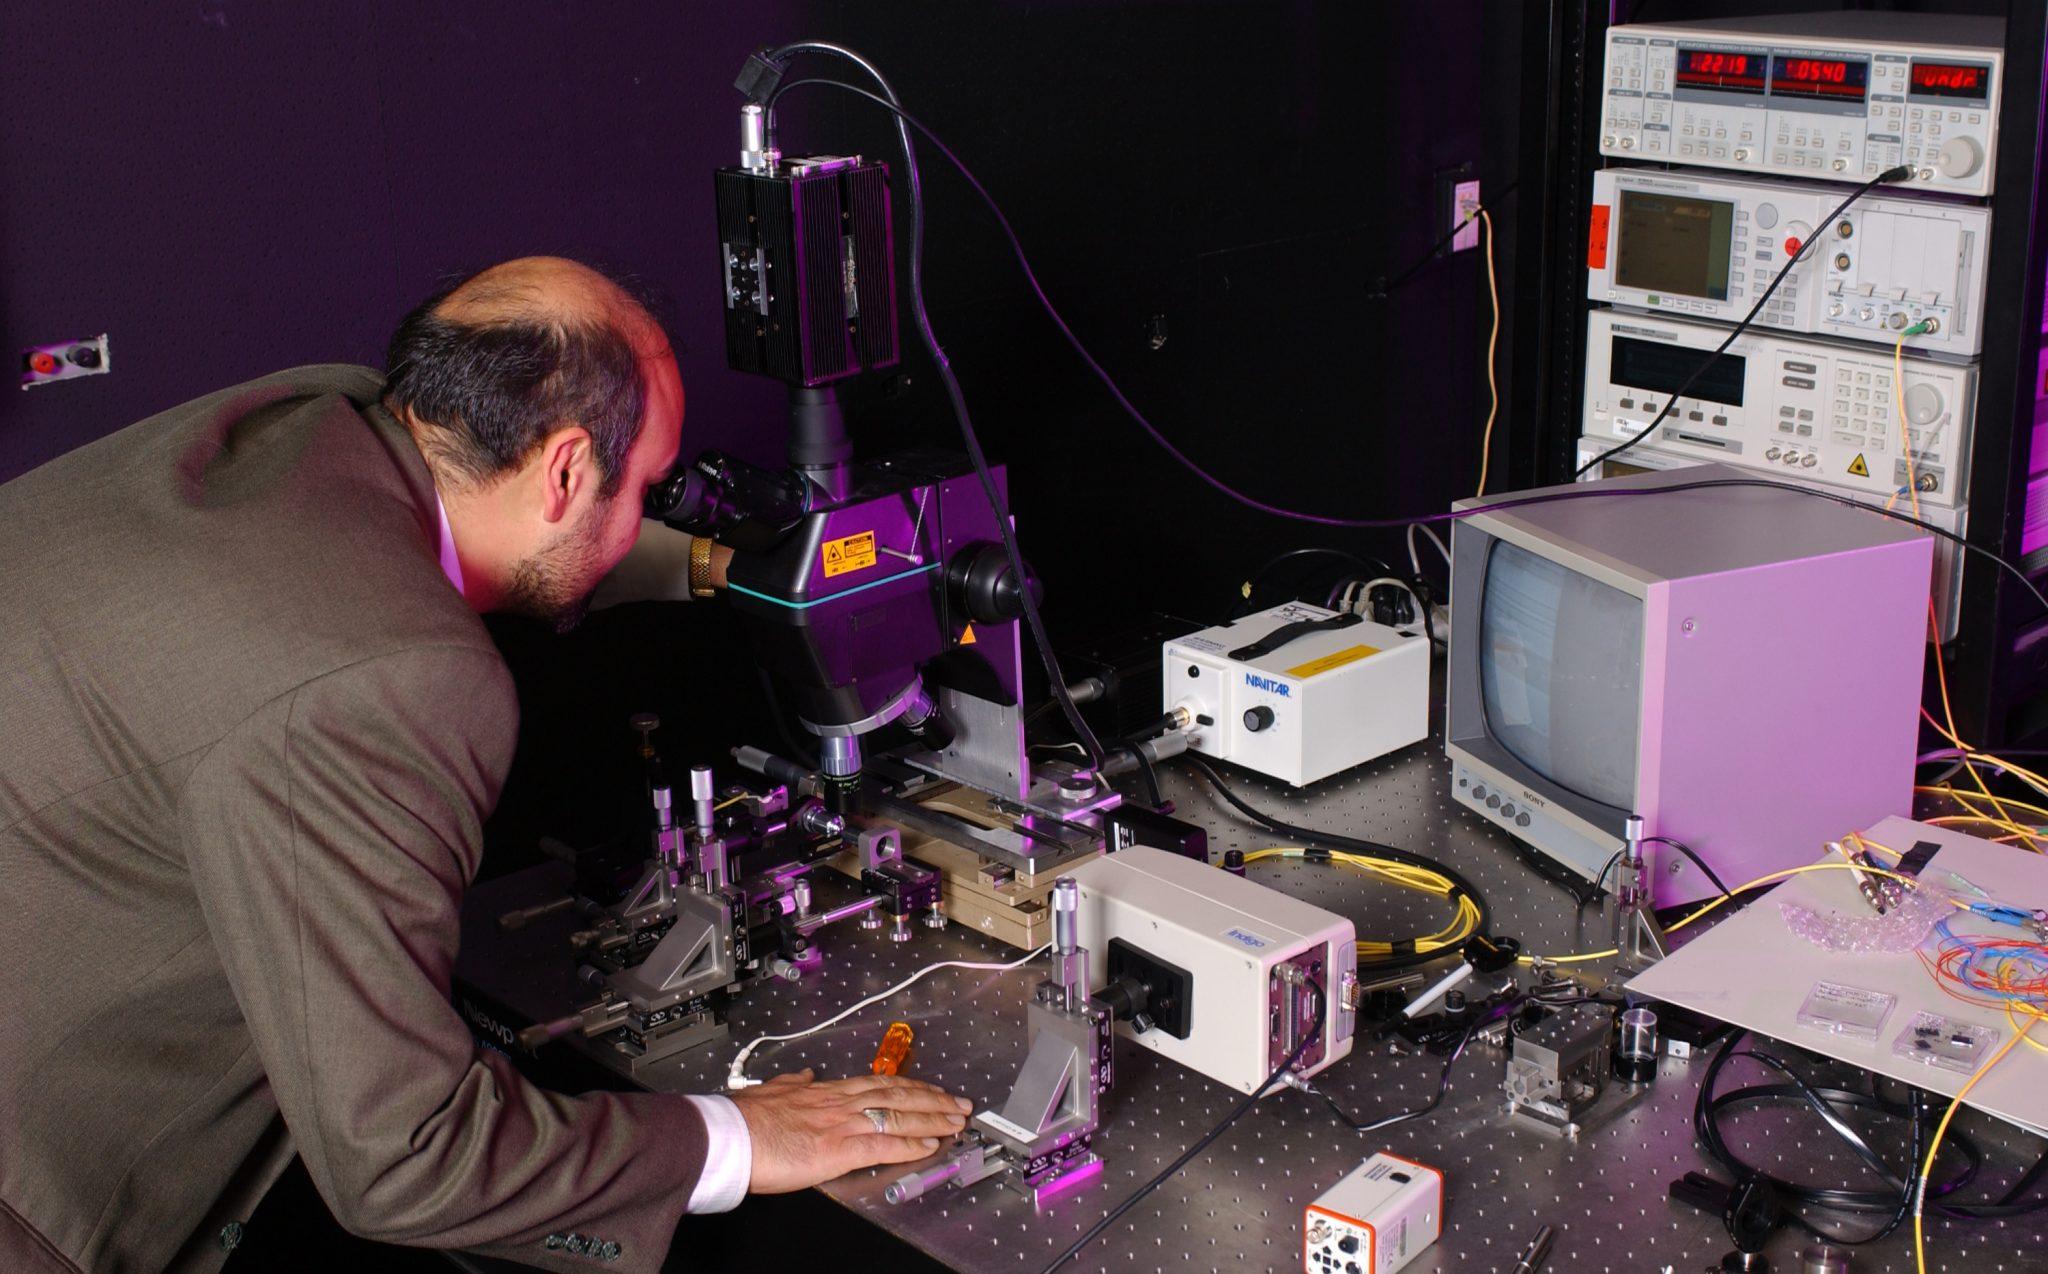 Darpa image on spectrometers